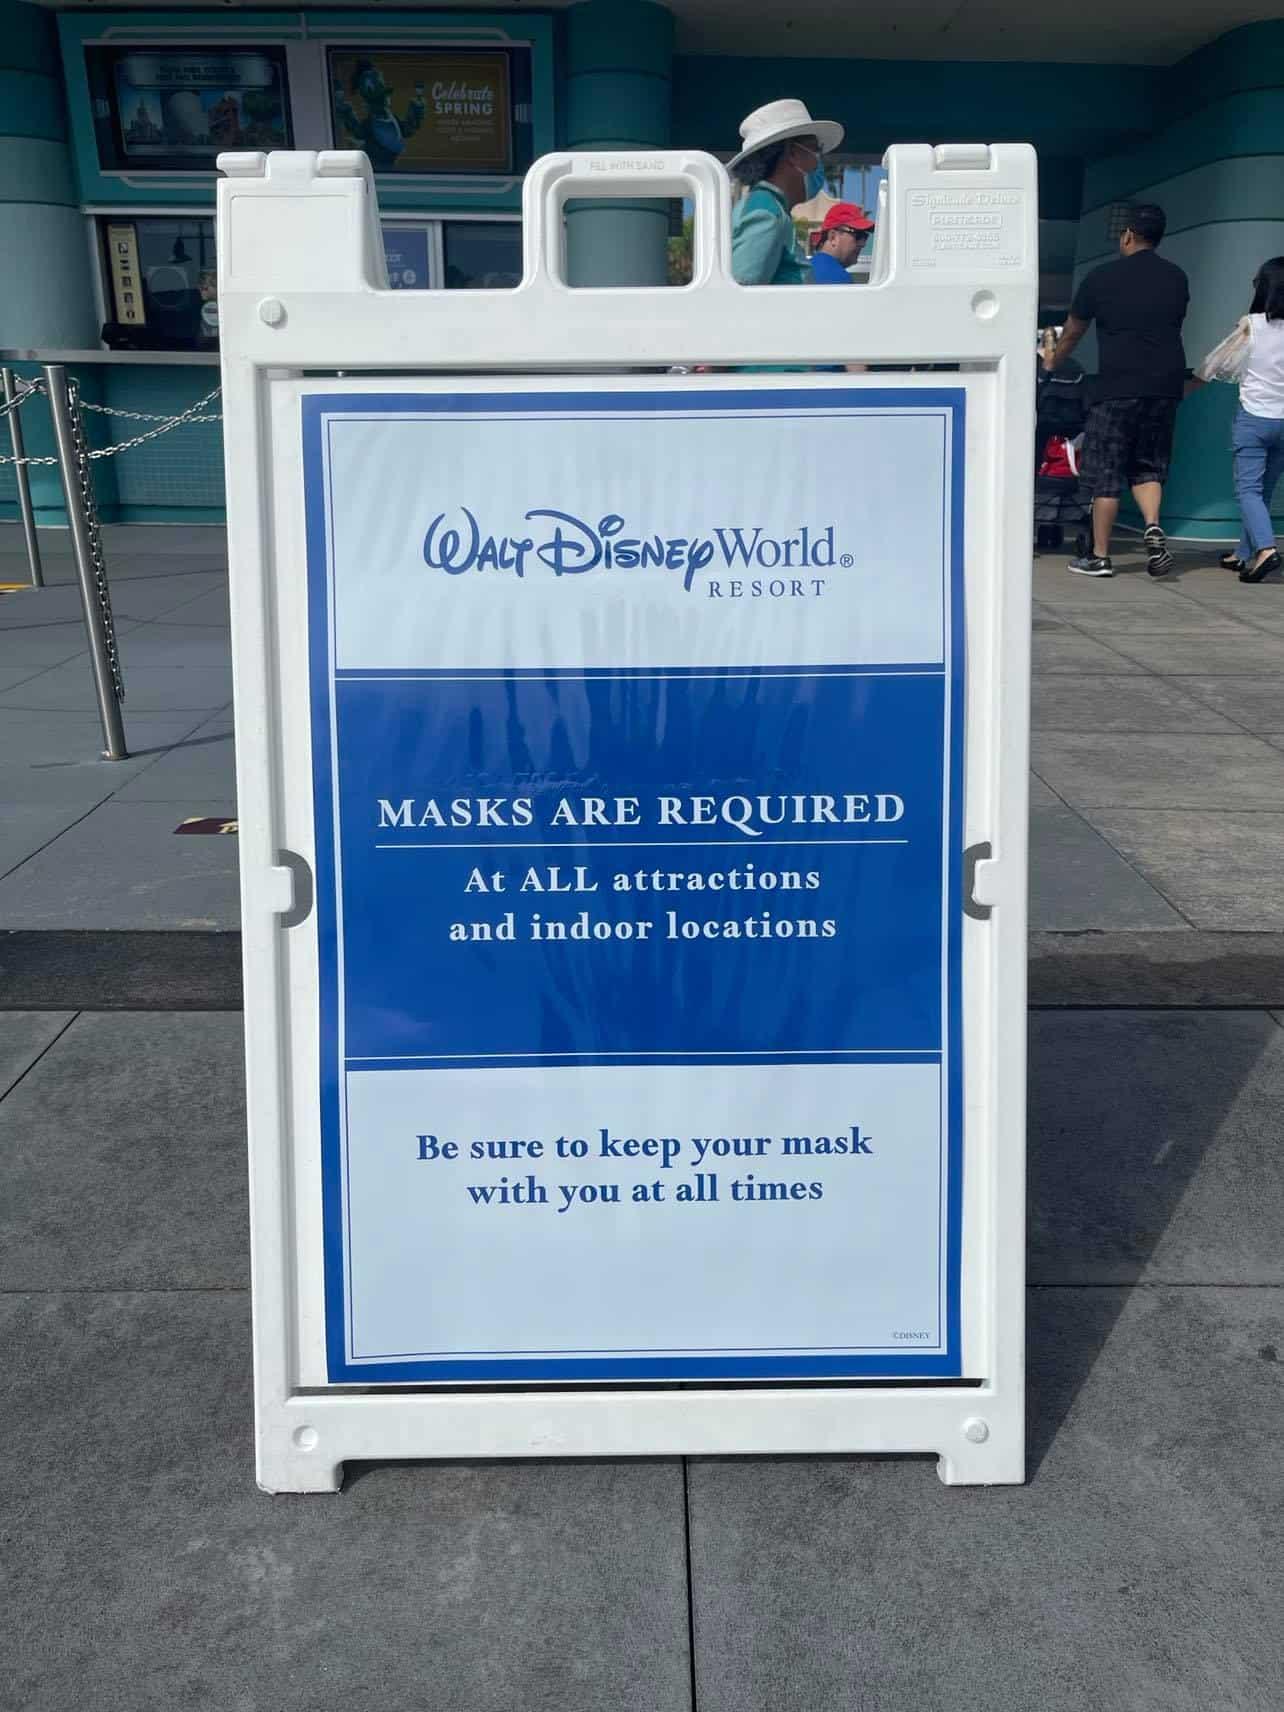 No-Masks-Required-Outdoors-at-Walt-Disney-World